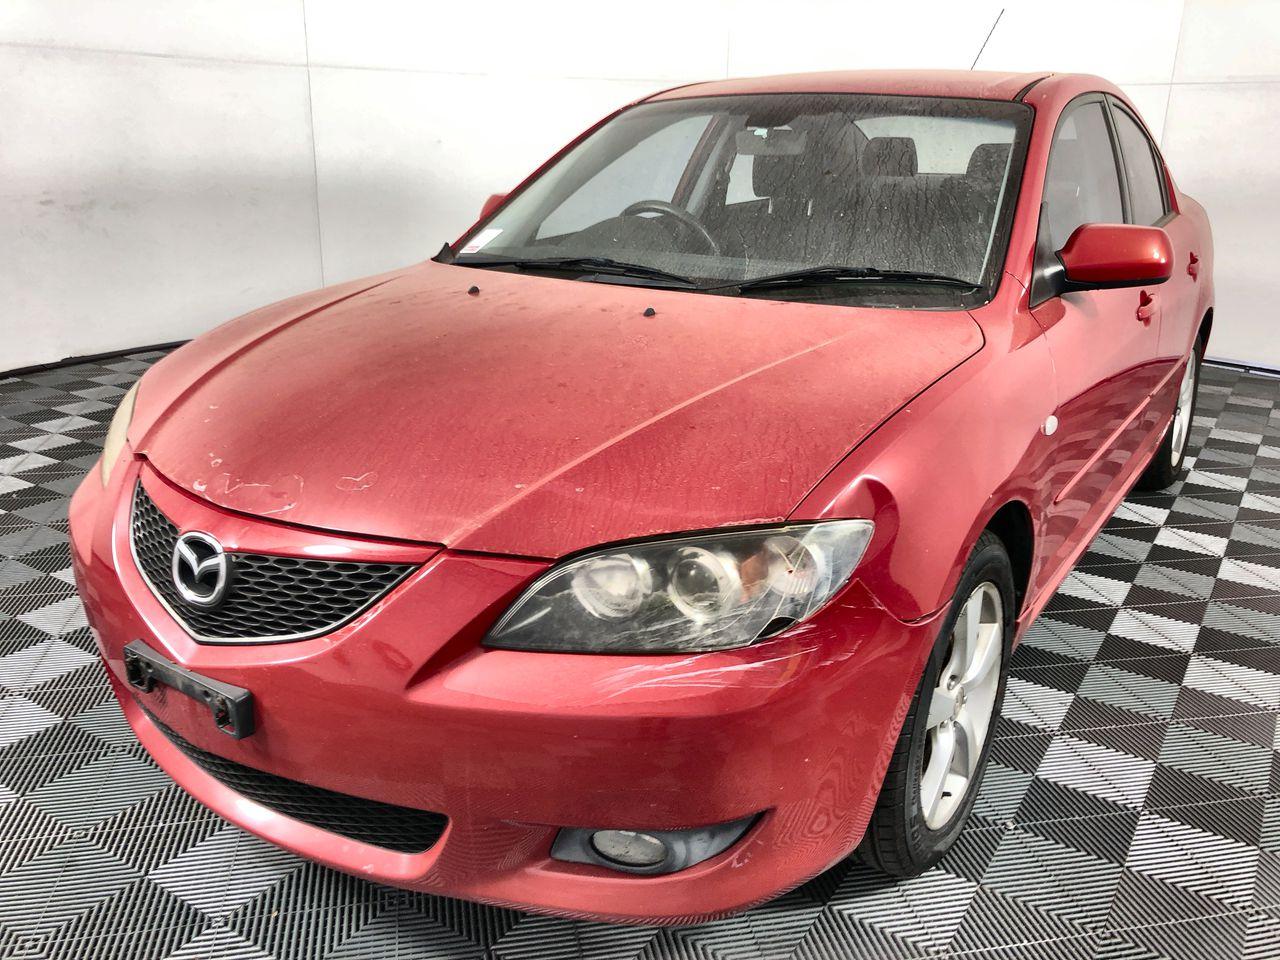 2004 Mazda 3 Maxx Sport BK Sedan, 136,101km